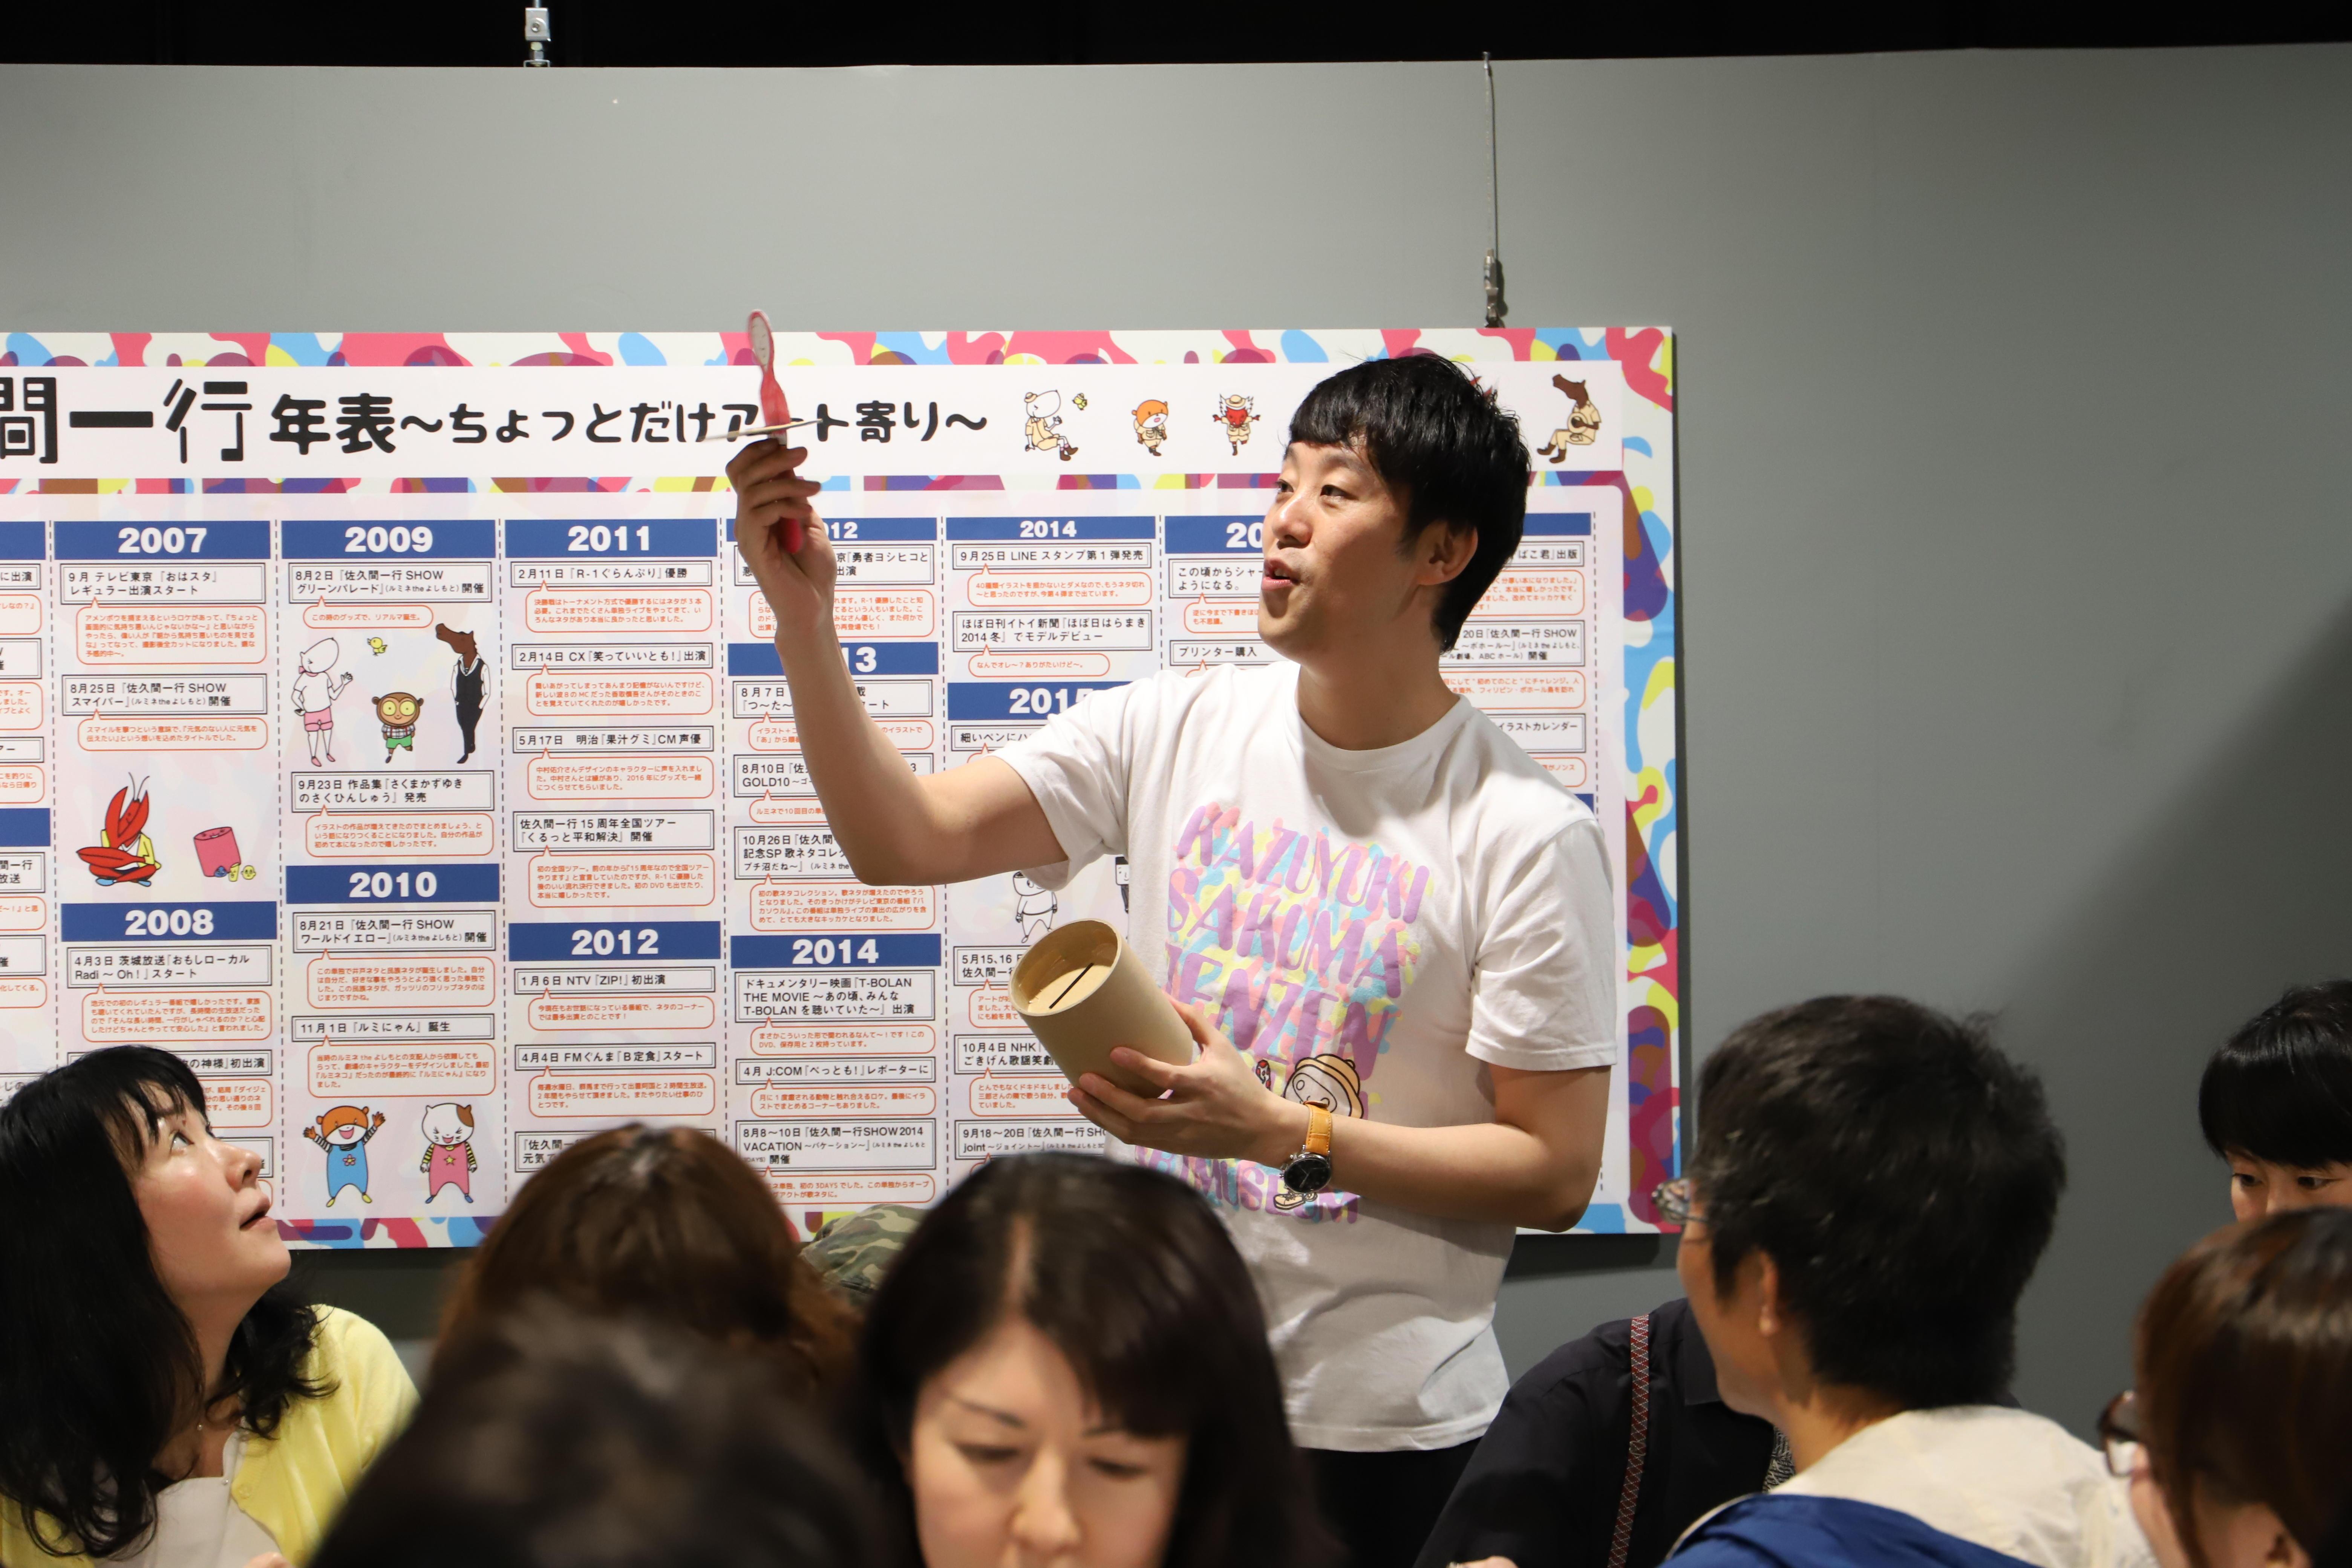 http://news.yoshimoto.co.jp/20180429220545-b0f957e4ee0d3782d547749dc28f2da2f92ea03f.jpg